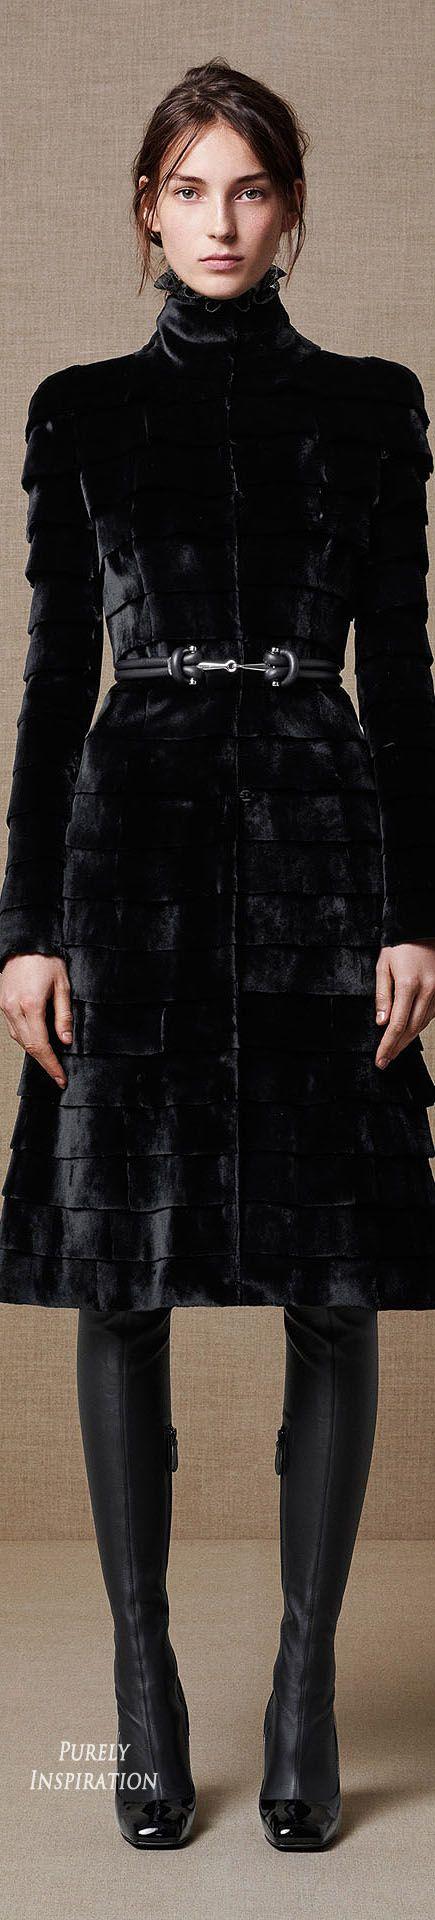 Alexander McQueen FW2015 Womens Fashion RTW   Purely Inspiration Clothing, Shoes & Jewelry - Women - women's belts - http://amzn.to/2kwF6LI